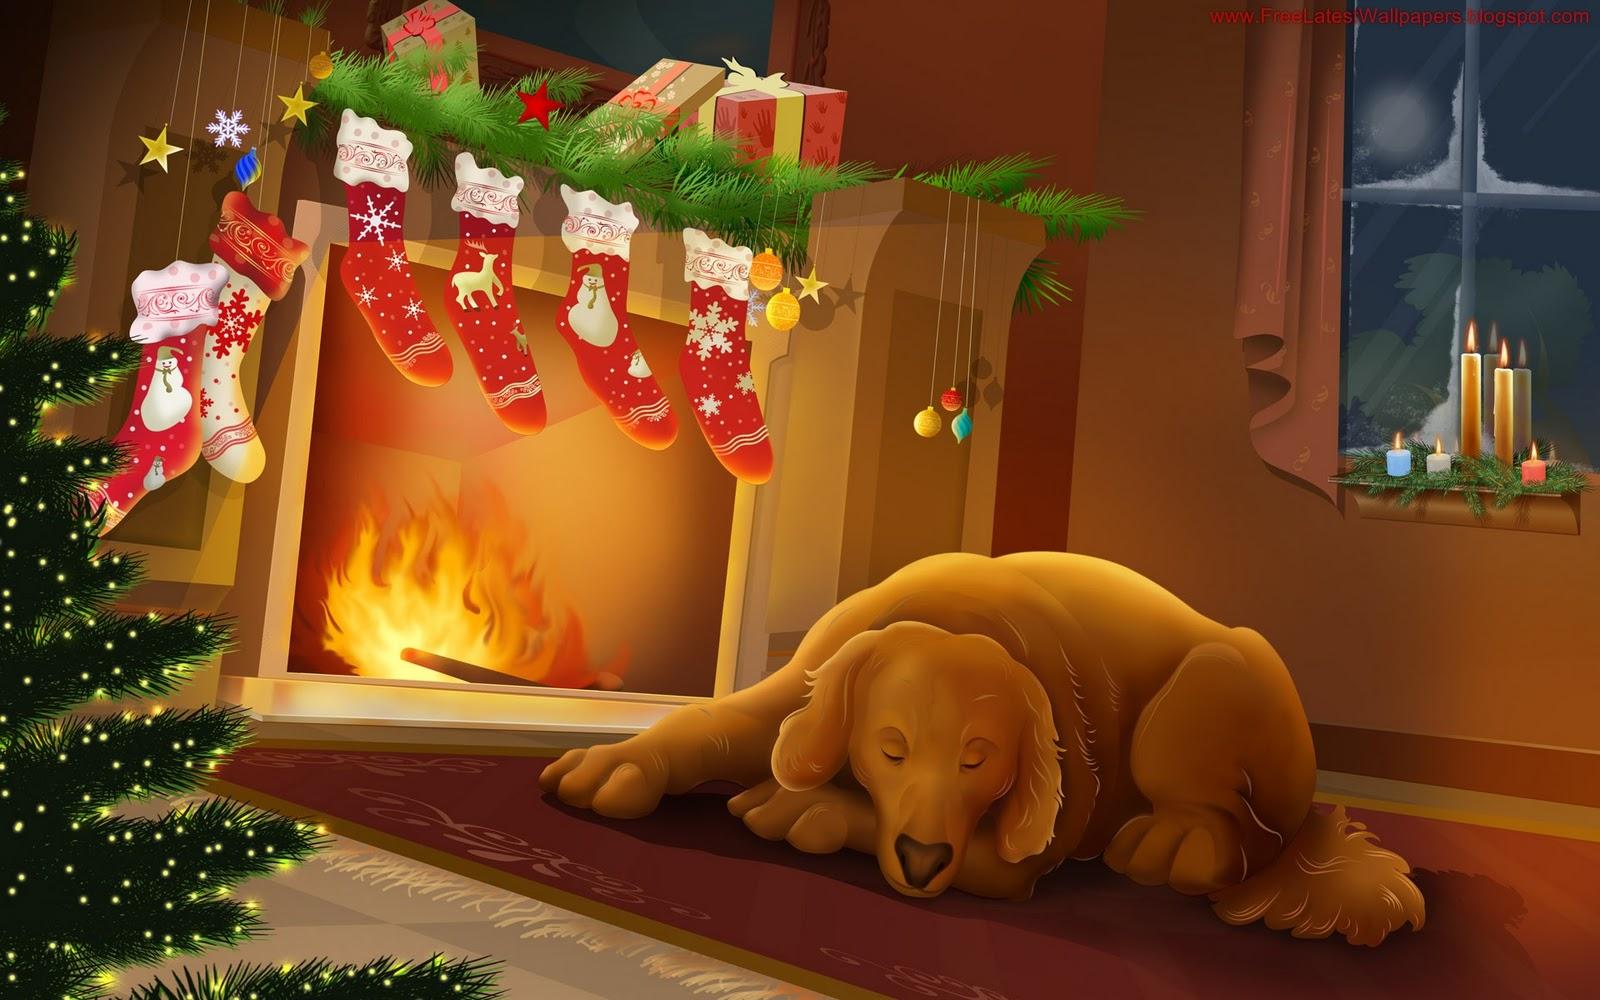 ilona wallpapers Cozy Christmas Fireplace Wallpaper 1600x1000